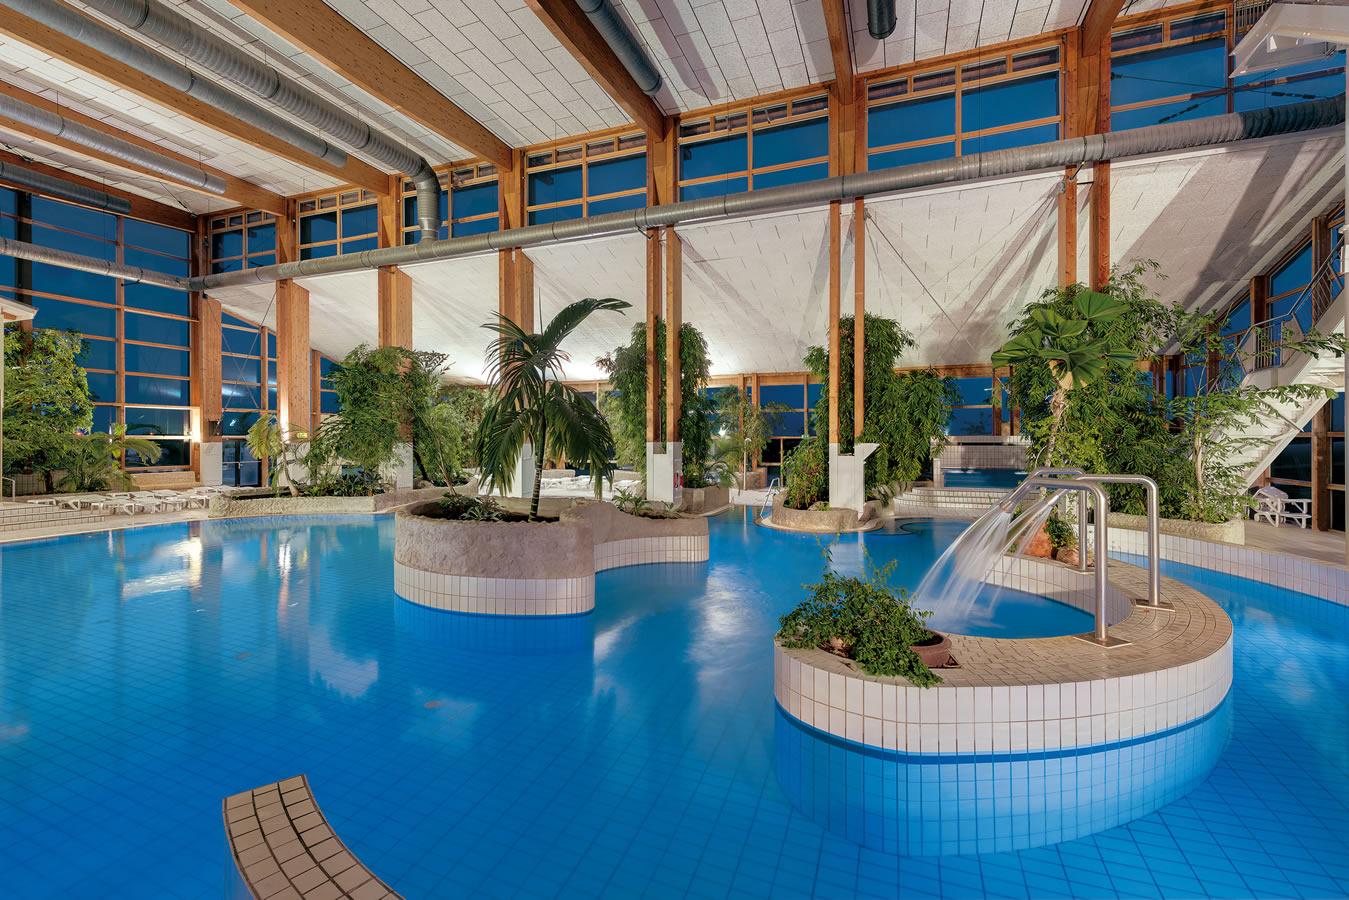 Hotels In Treuchtlingen Deutschland